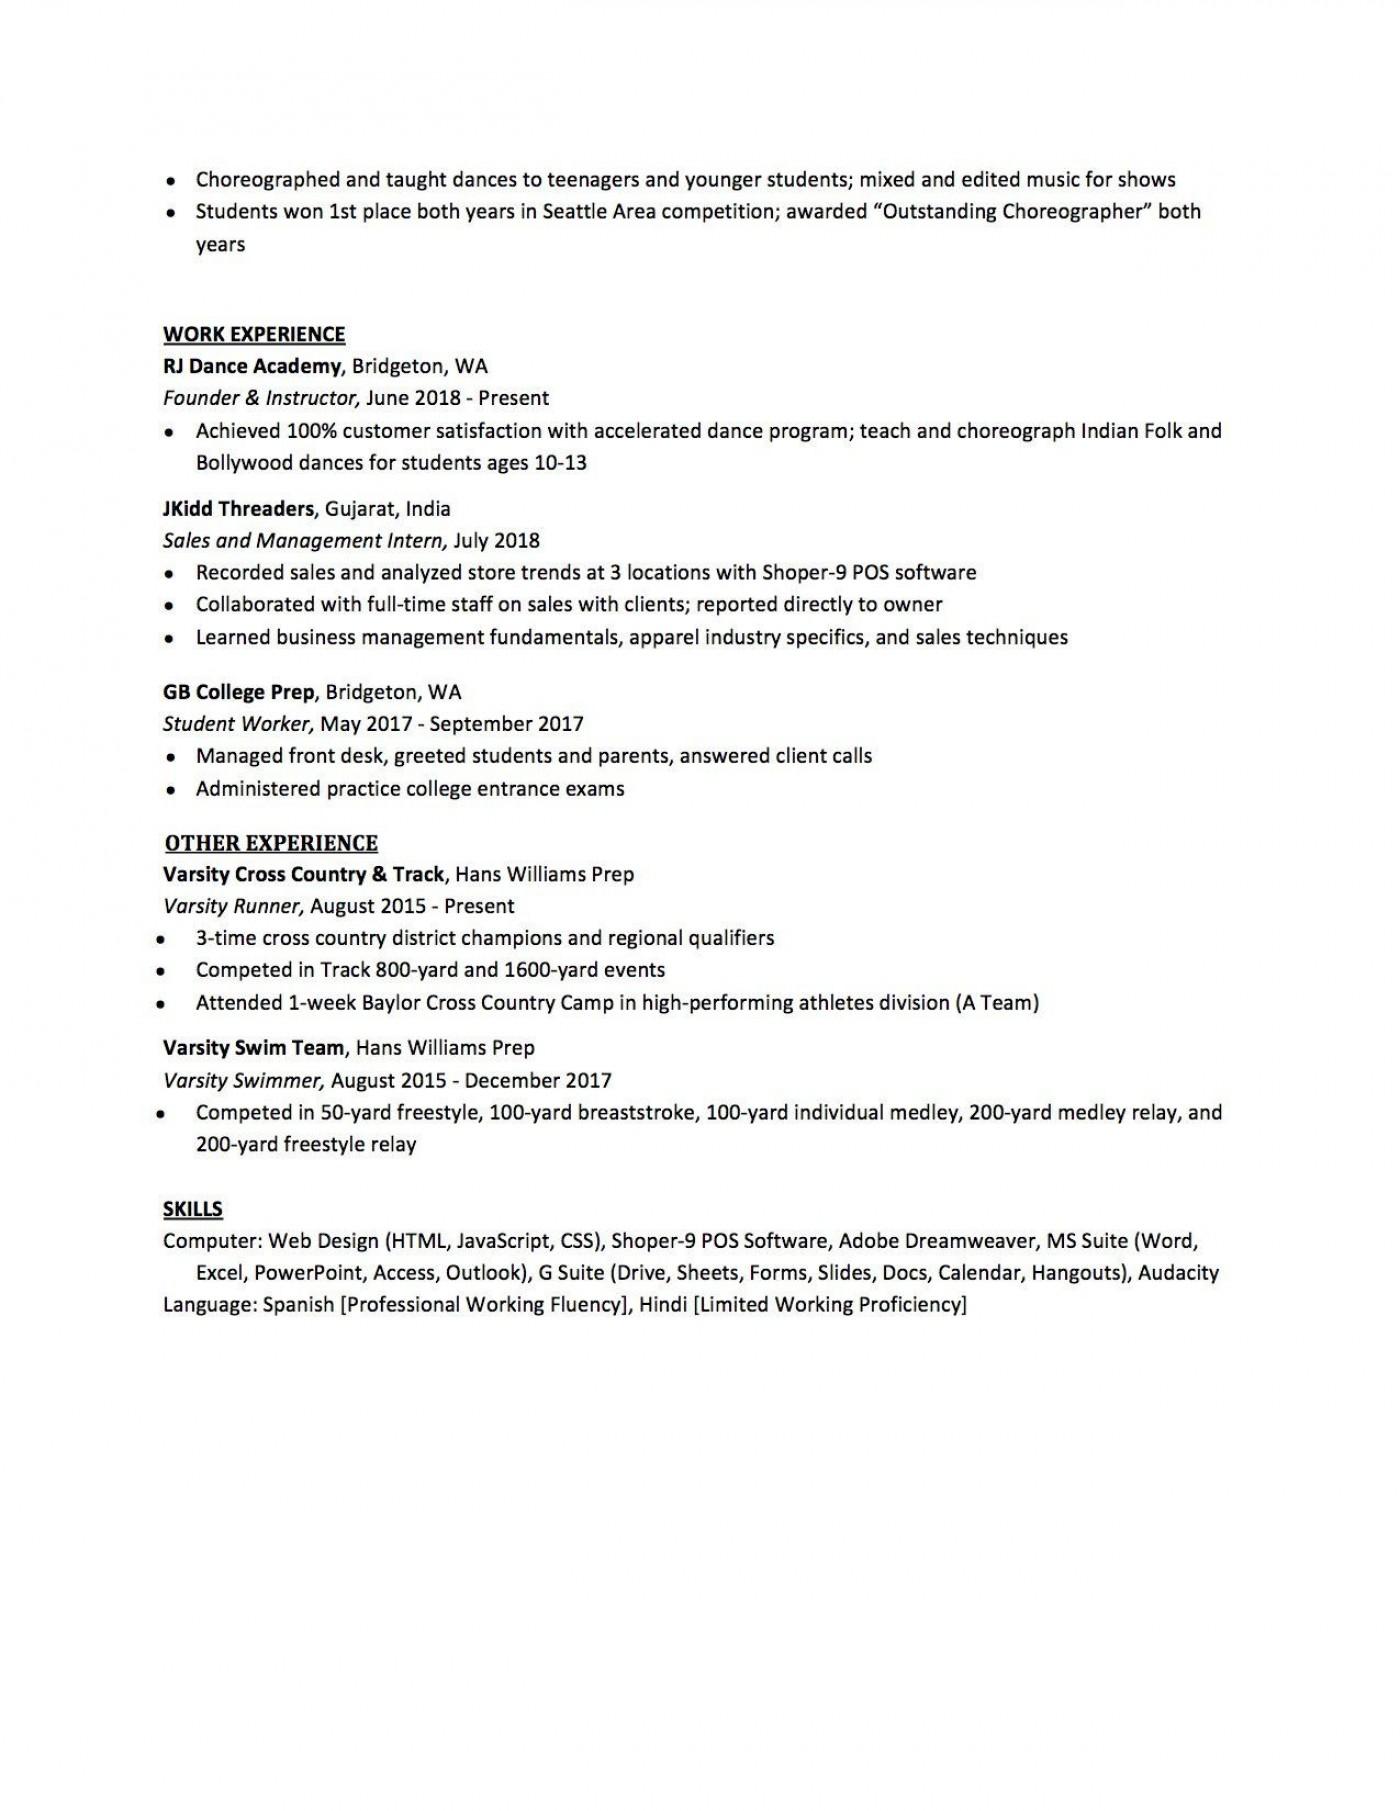 008 Simple Resume Template High School Photo  Student Australia For Google Doc Graduate Microsoft Word1400